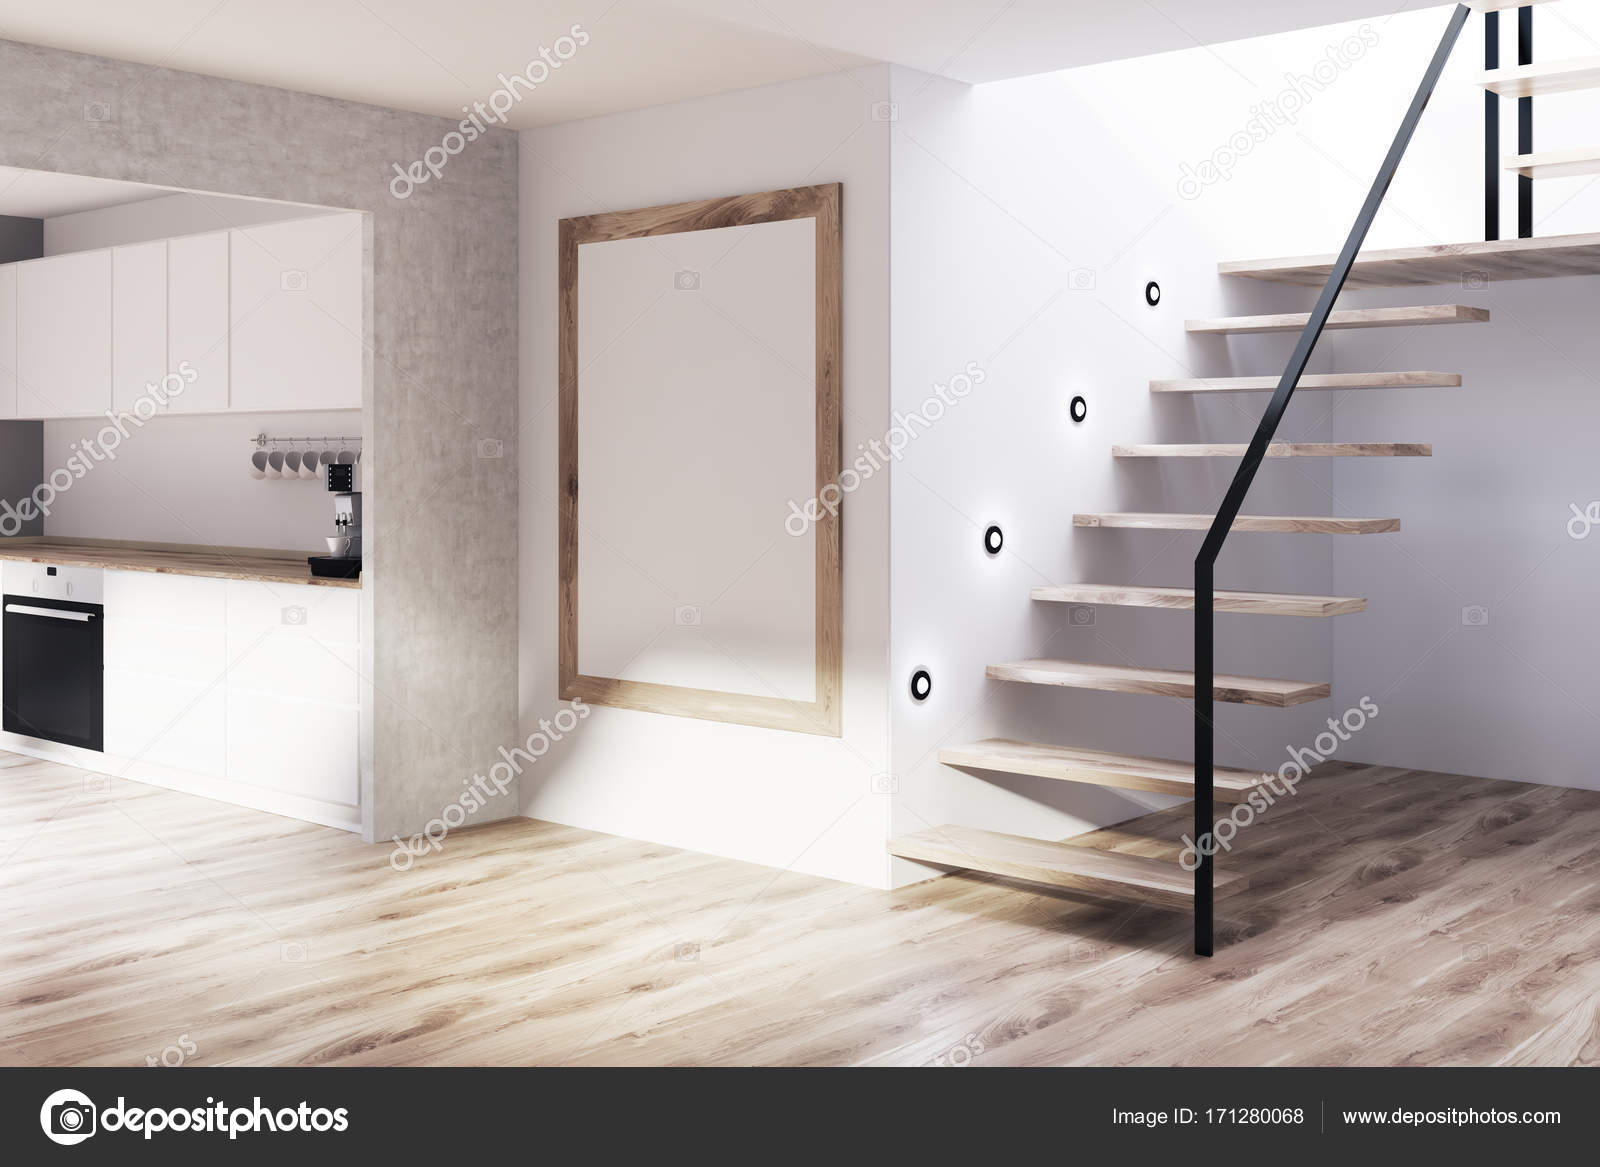 Gray Kuche Aus Holz Treppen Plakat Ecke Stockfoto